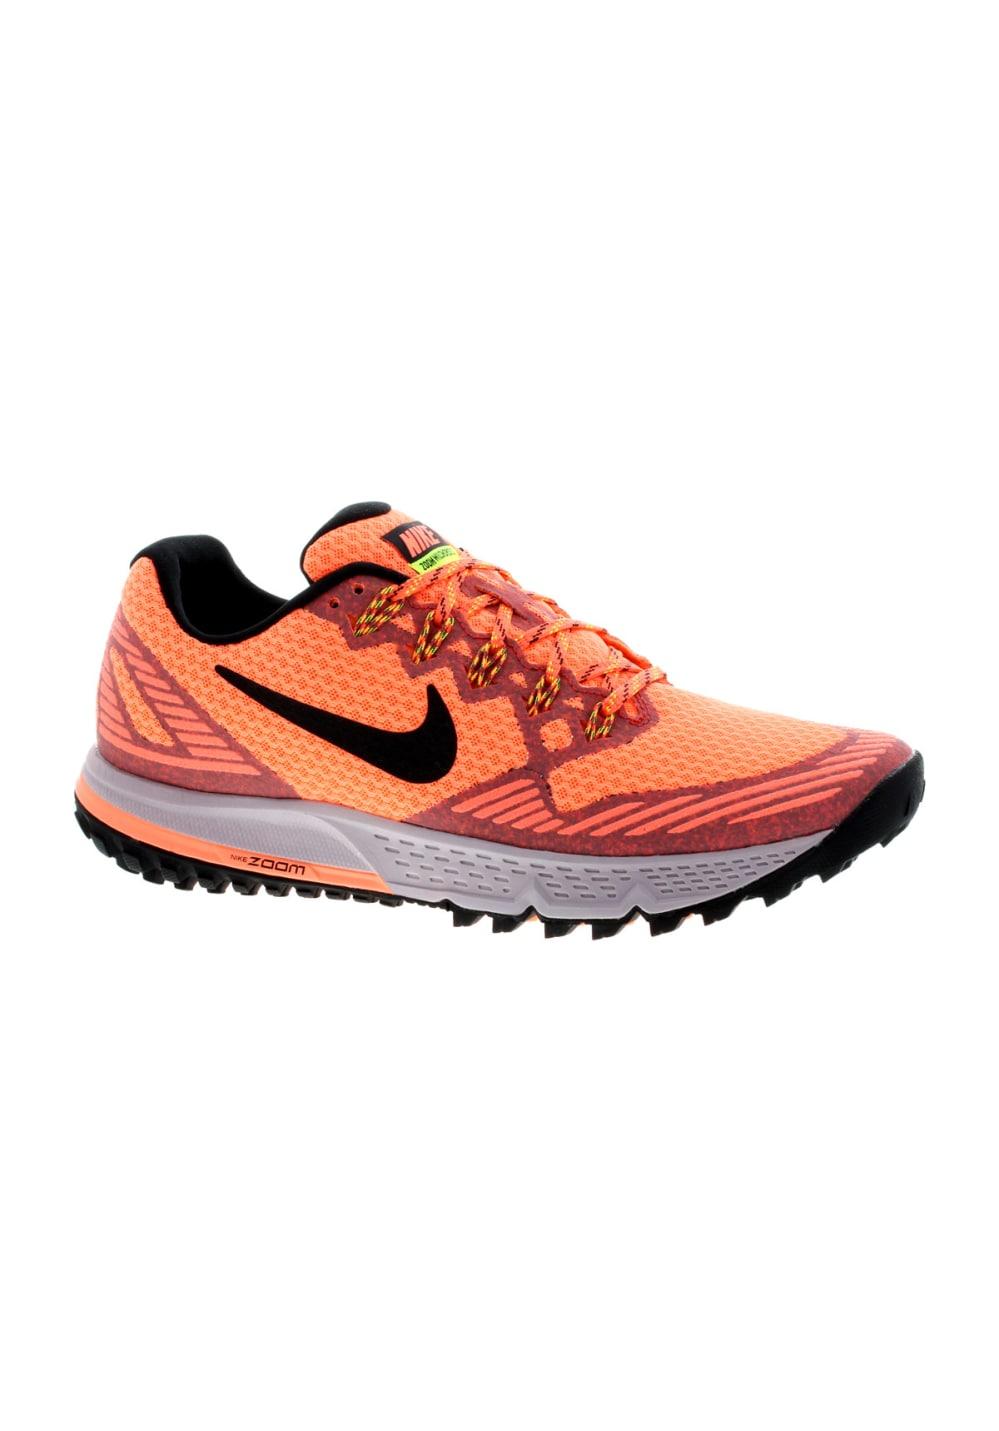 san francisco a5d52 35451 Next. Nike. Air Zoom Wildhorse 3 - Chaussures running pour Femme